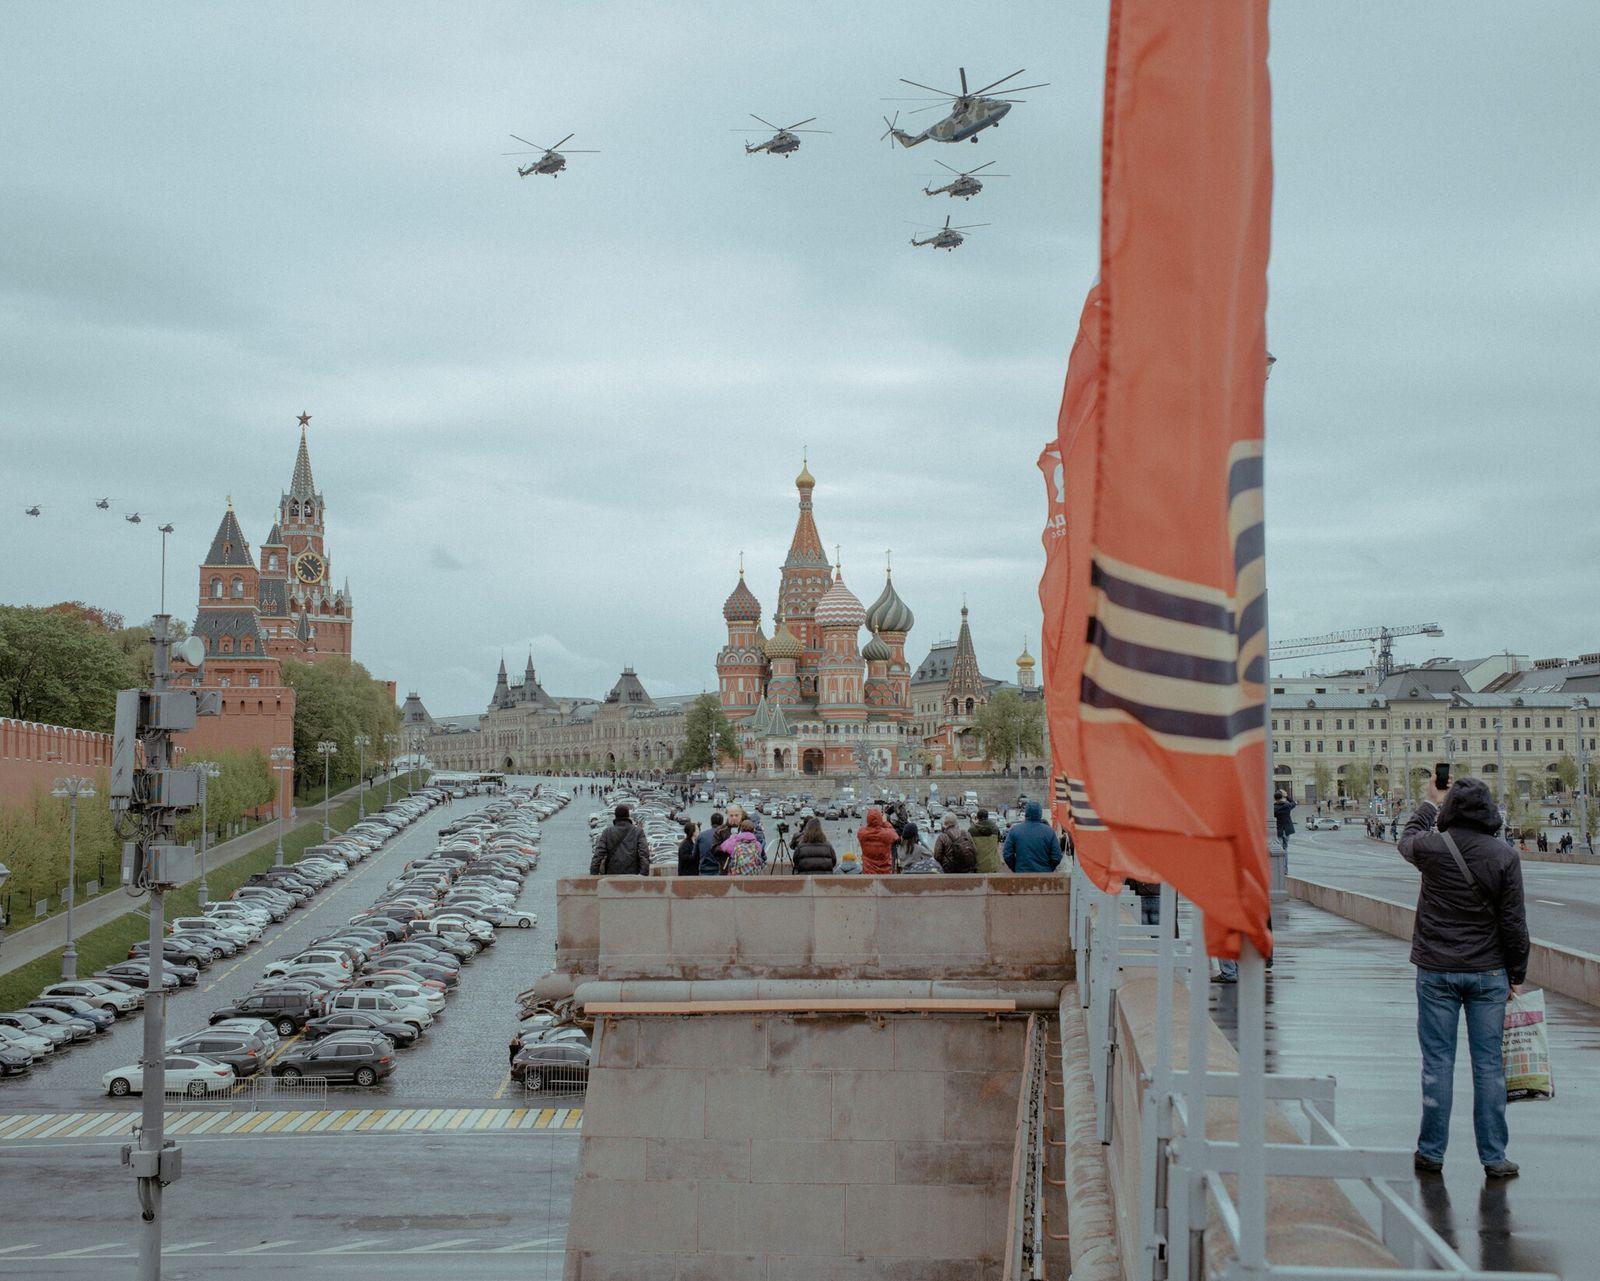 Aviones militares sobrevuelan la Plaza Roja